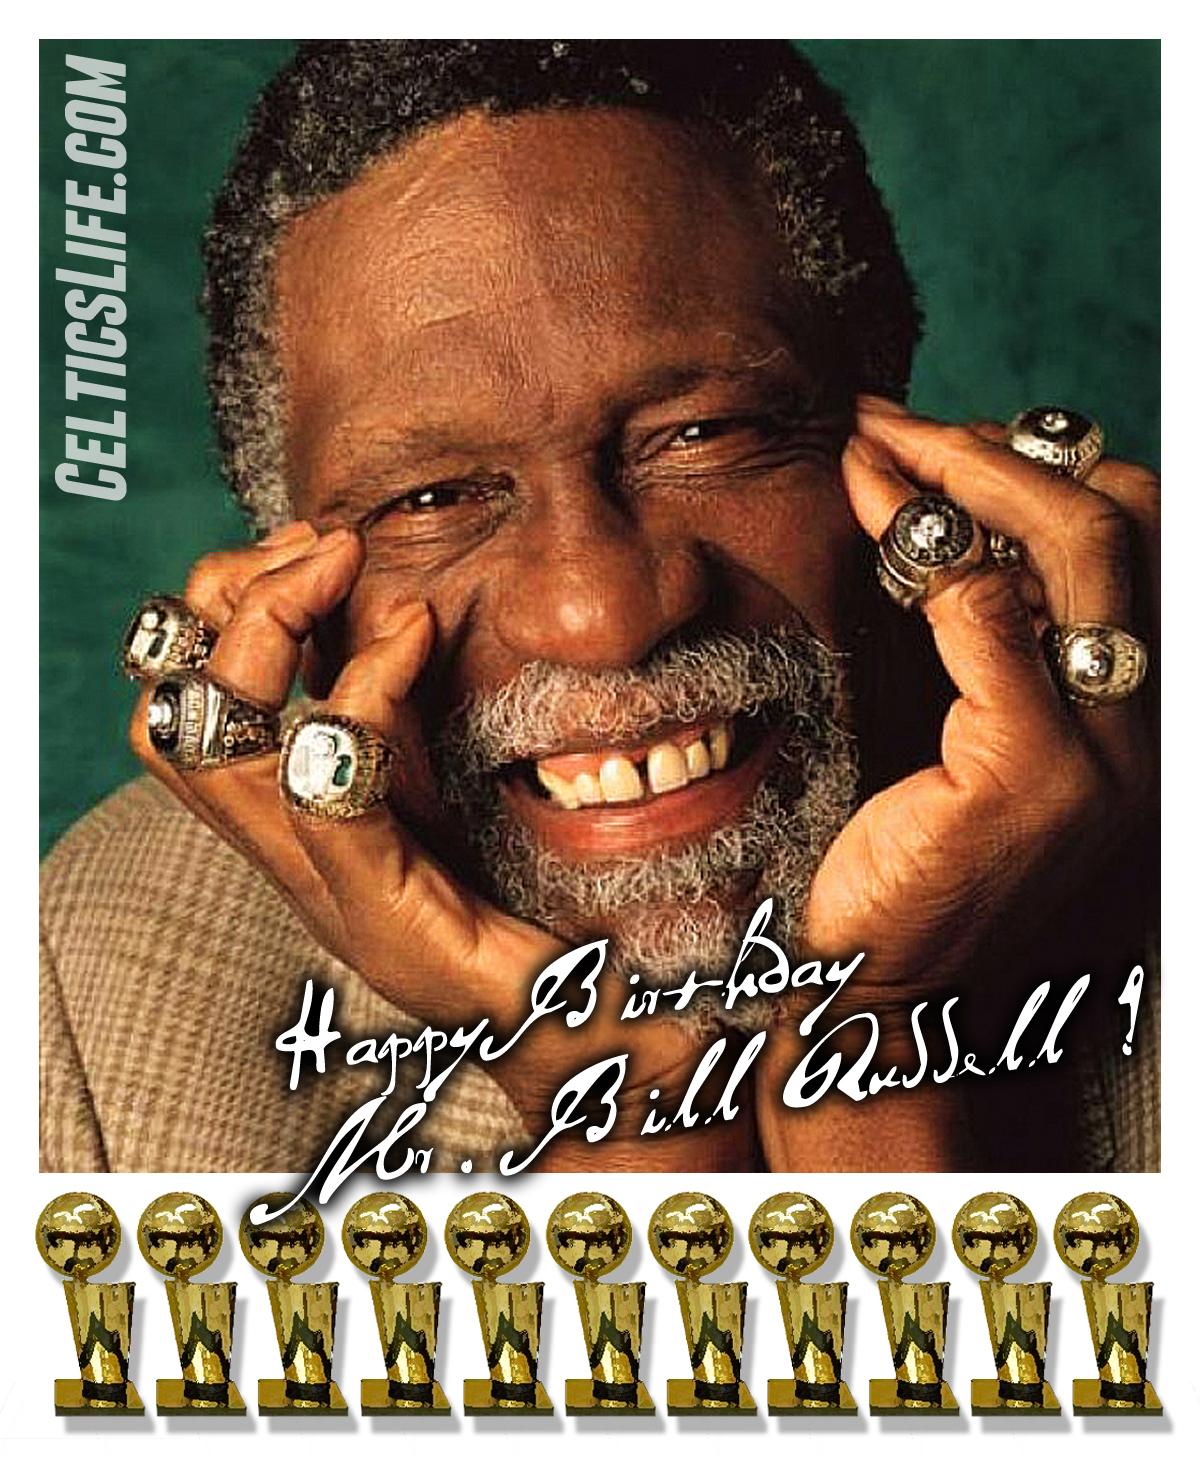 Happy Birthday Mr Russell